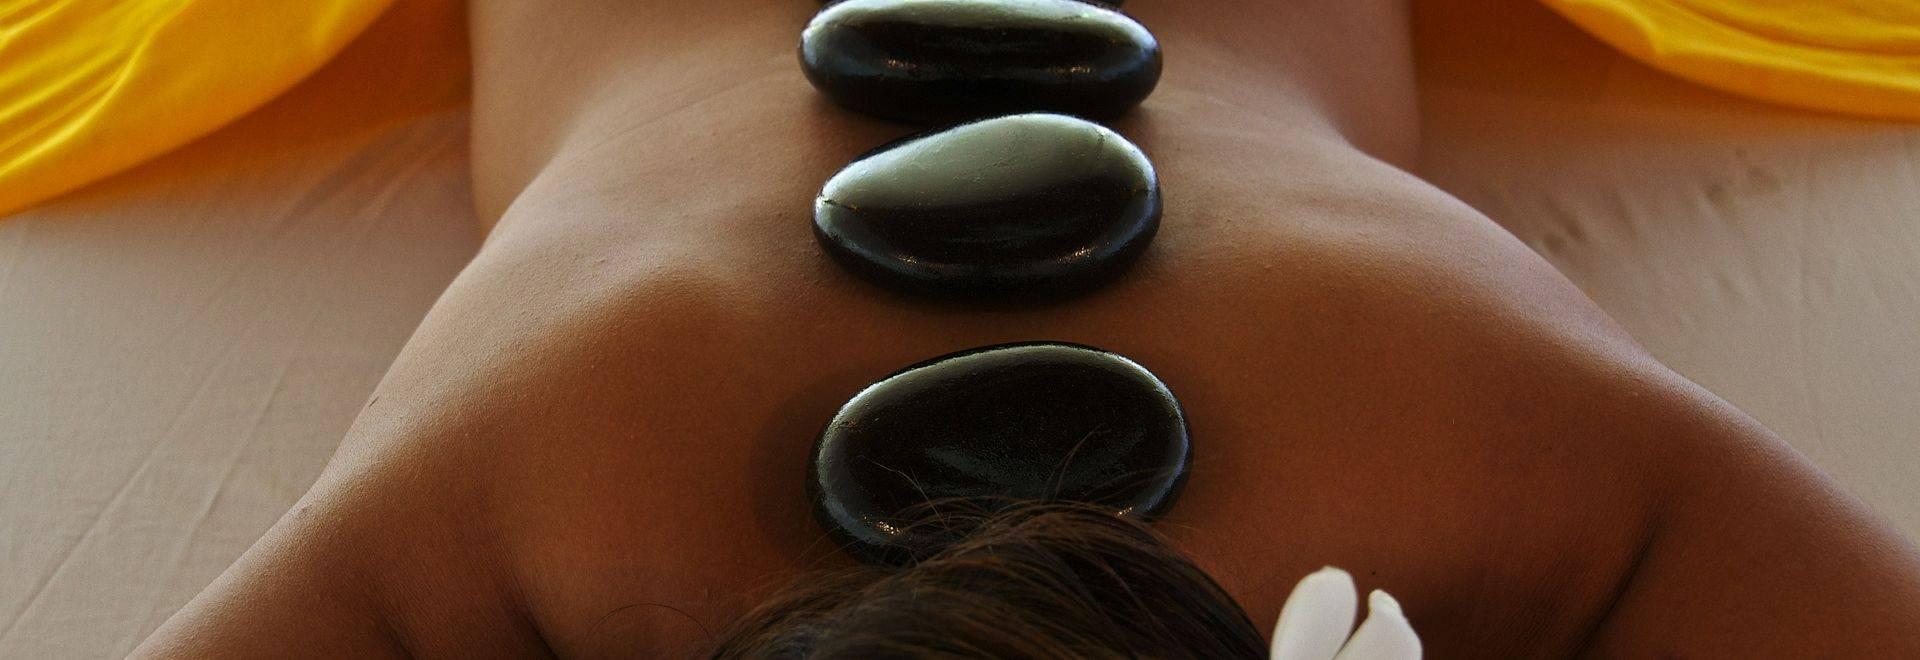 Atmosphere-Resort-hot-stone-massage.jpg